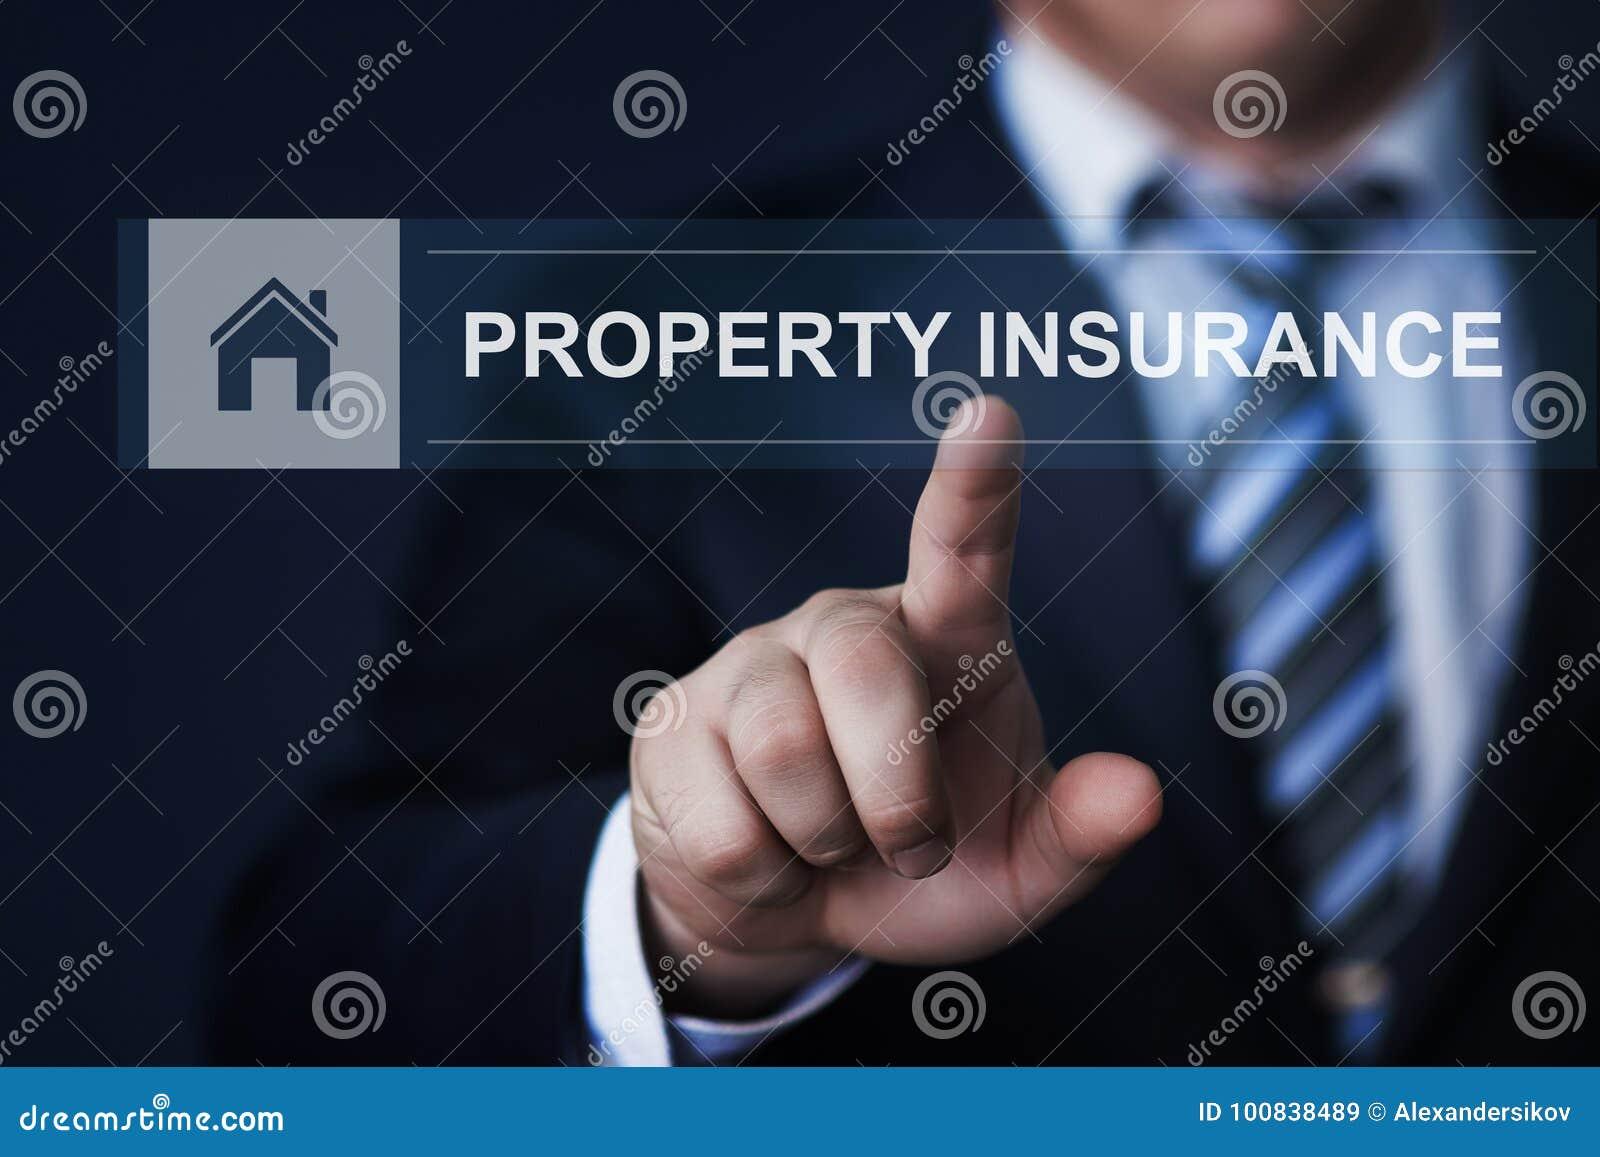 Property Investment Management Real Estate Market Internet Business Technology Concept